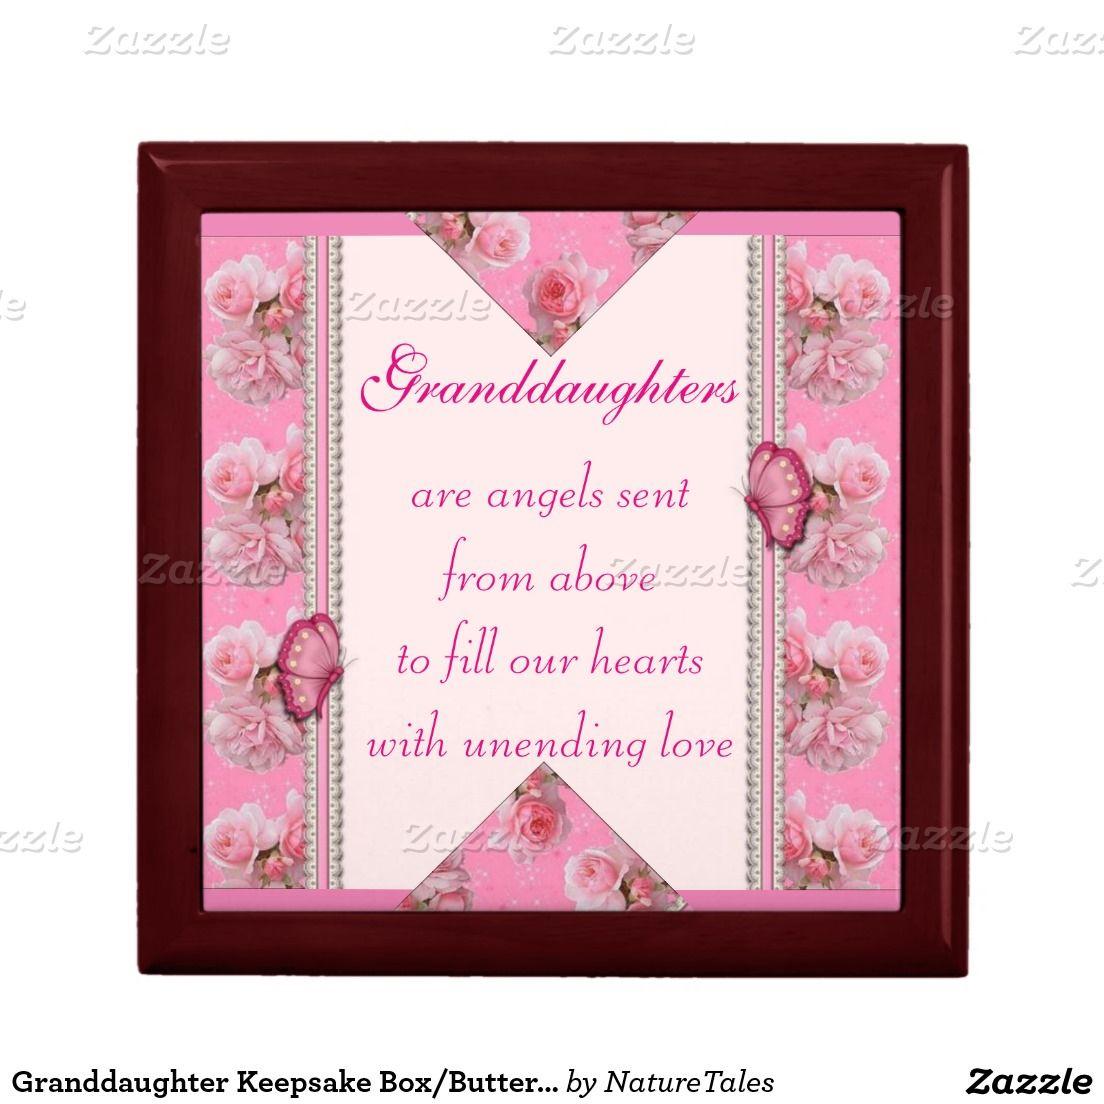 Granddaughter Keepsake Box/Butterfly & Roses Trinket Boxes